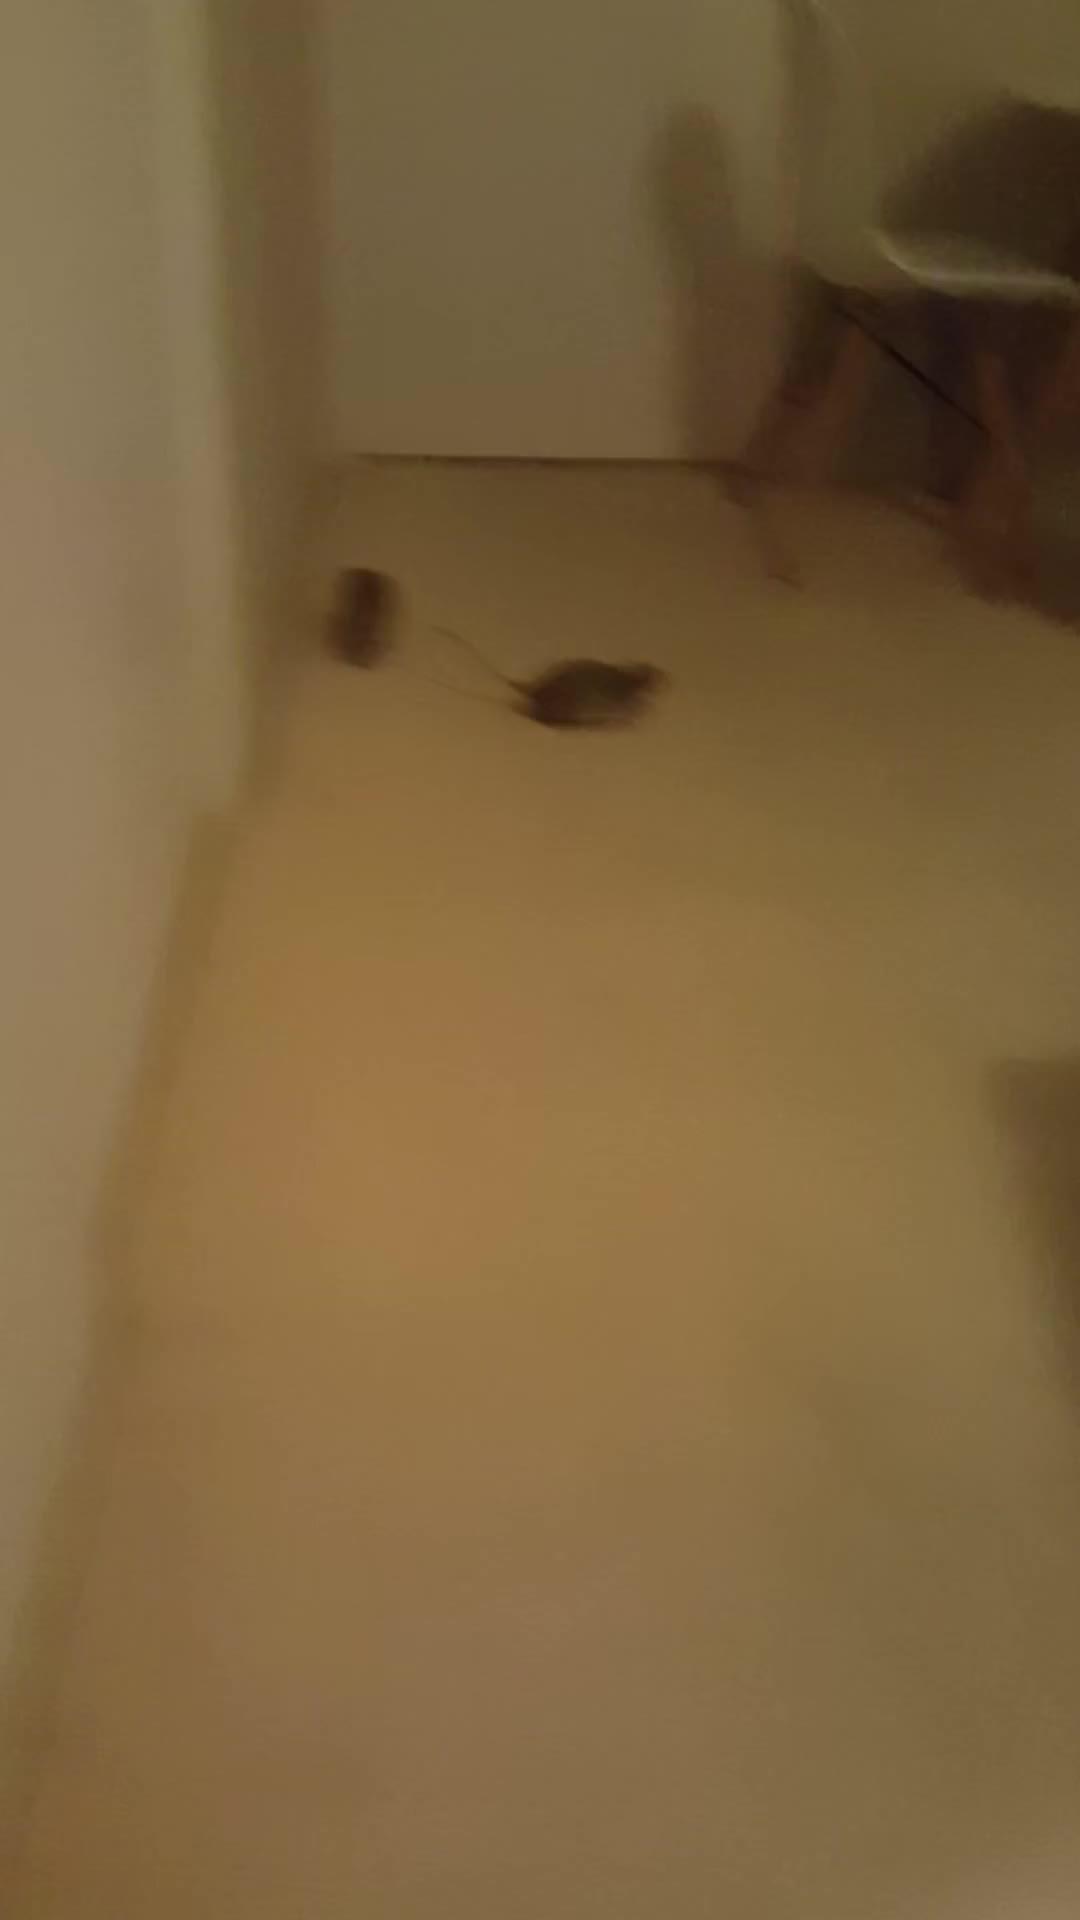 r/RATS Gifs (Reddit Gallery) - Scrolller